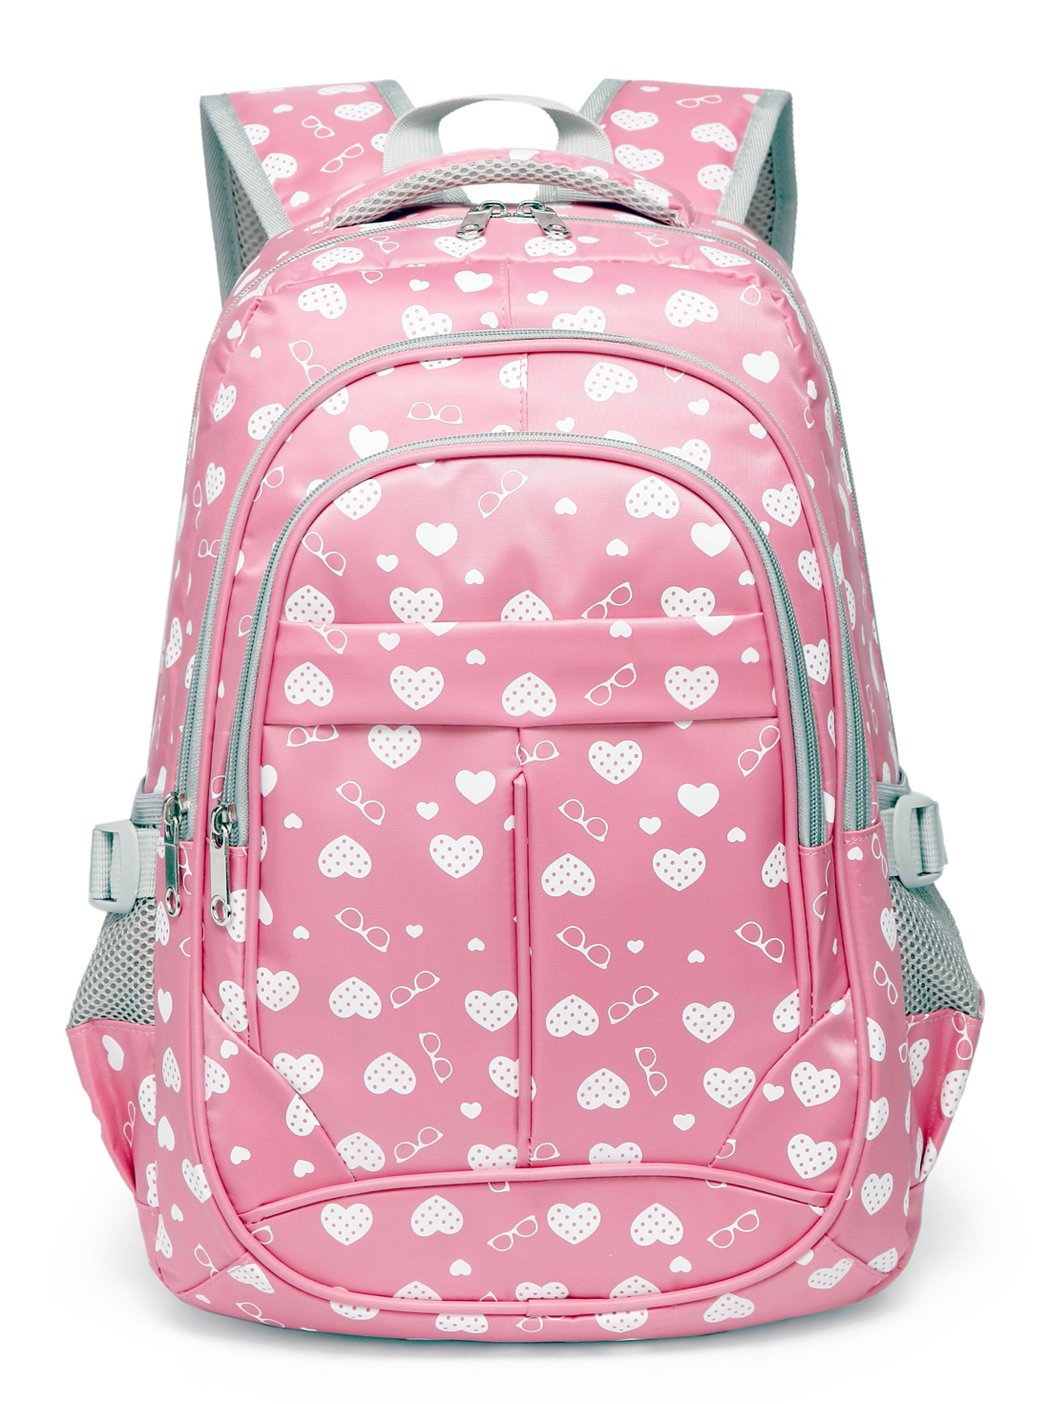 Sweetheart School Backpacks for Girls Children Kids Bookbags (Pink) by BLUEFAIRY